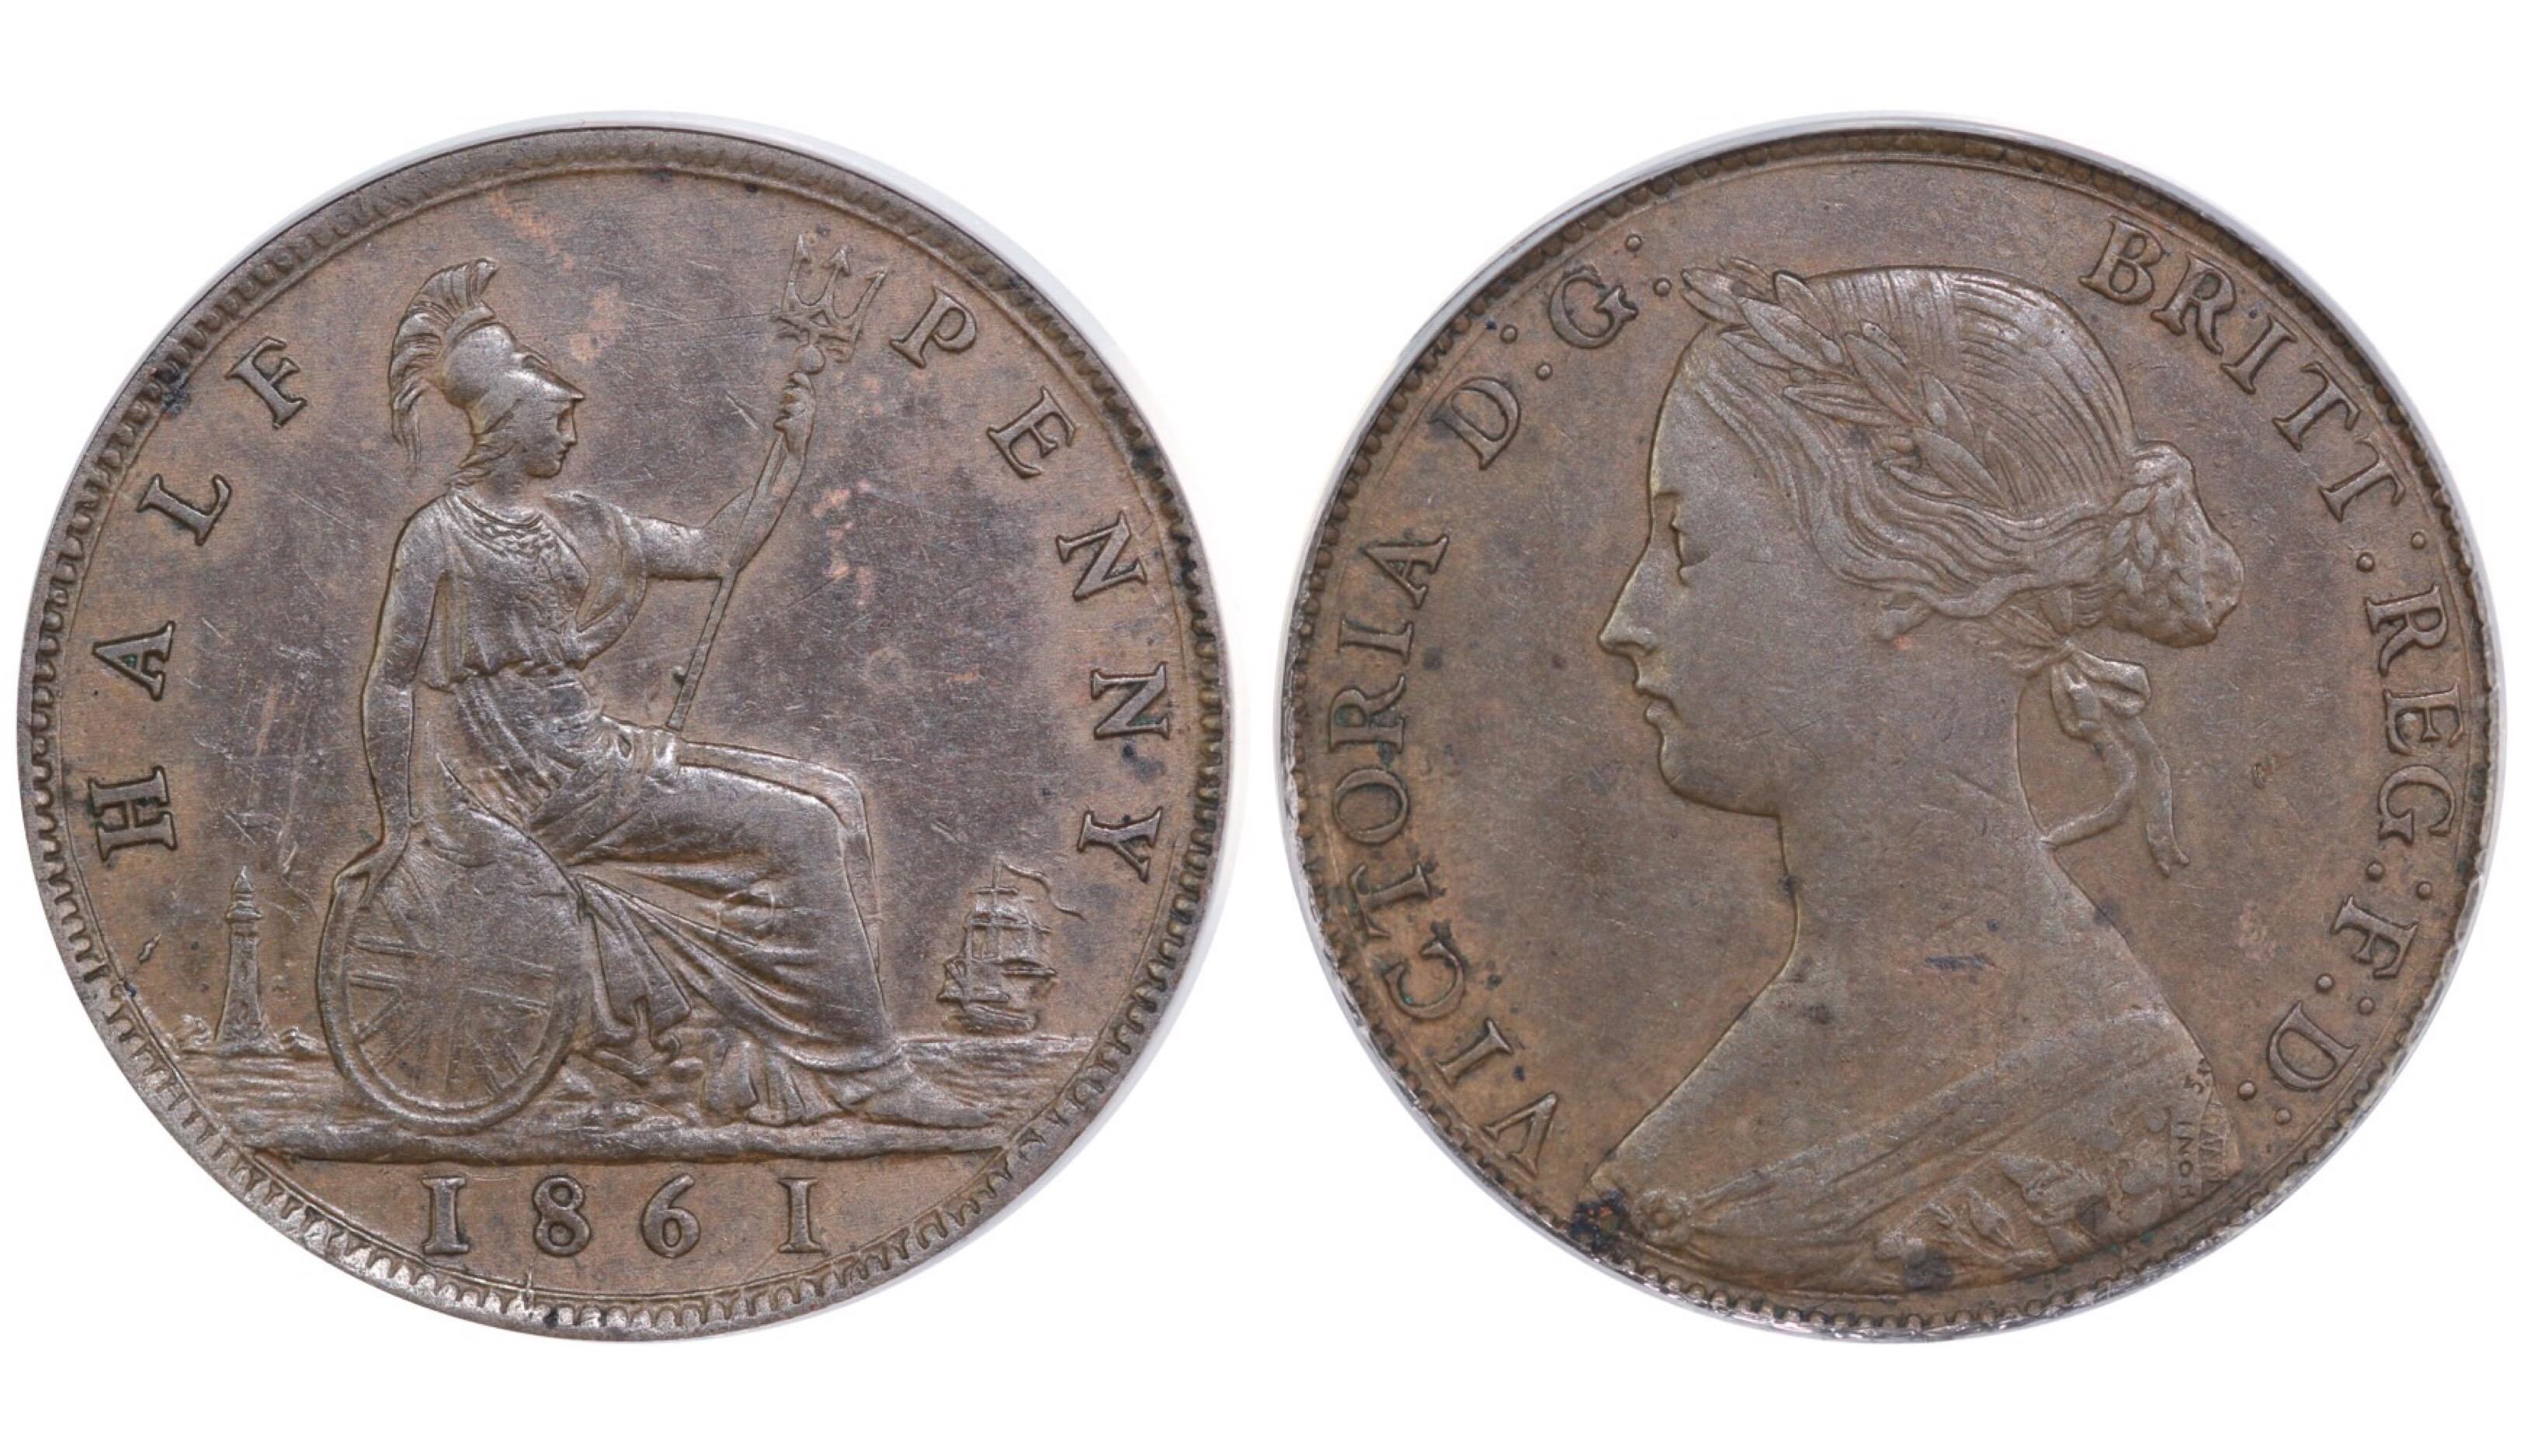 1861 Halfpenny, CGS 45, Dies 6G, Freeman 277, UIN 22097